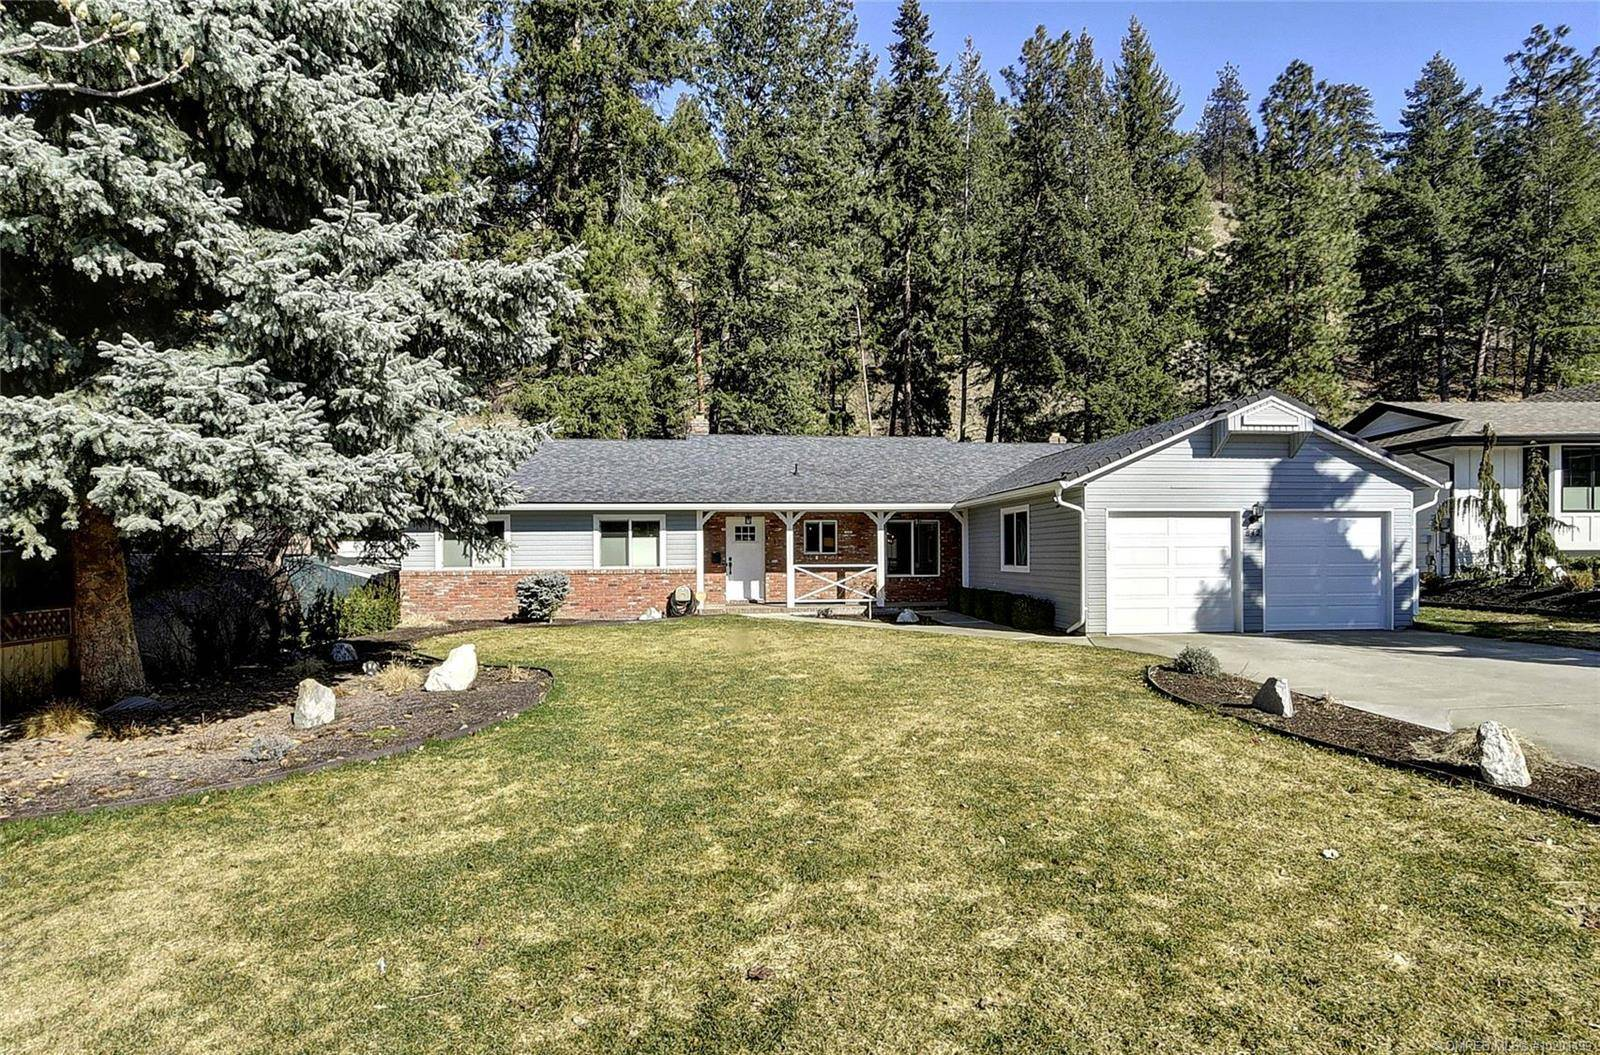 House for sale at 842 Lydford Pl Kelowna British Columbia - MLS: 10201499